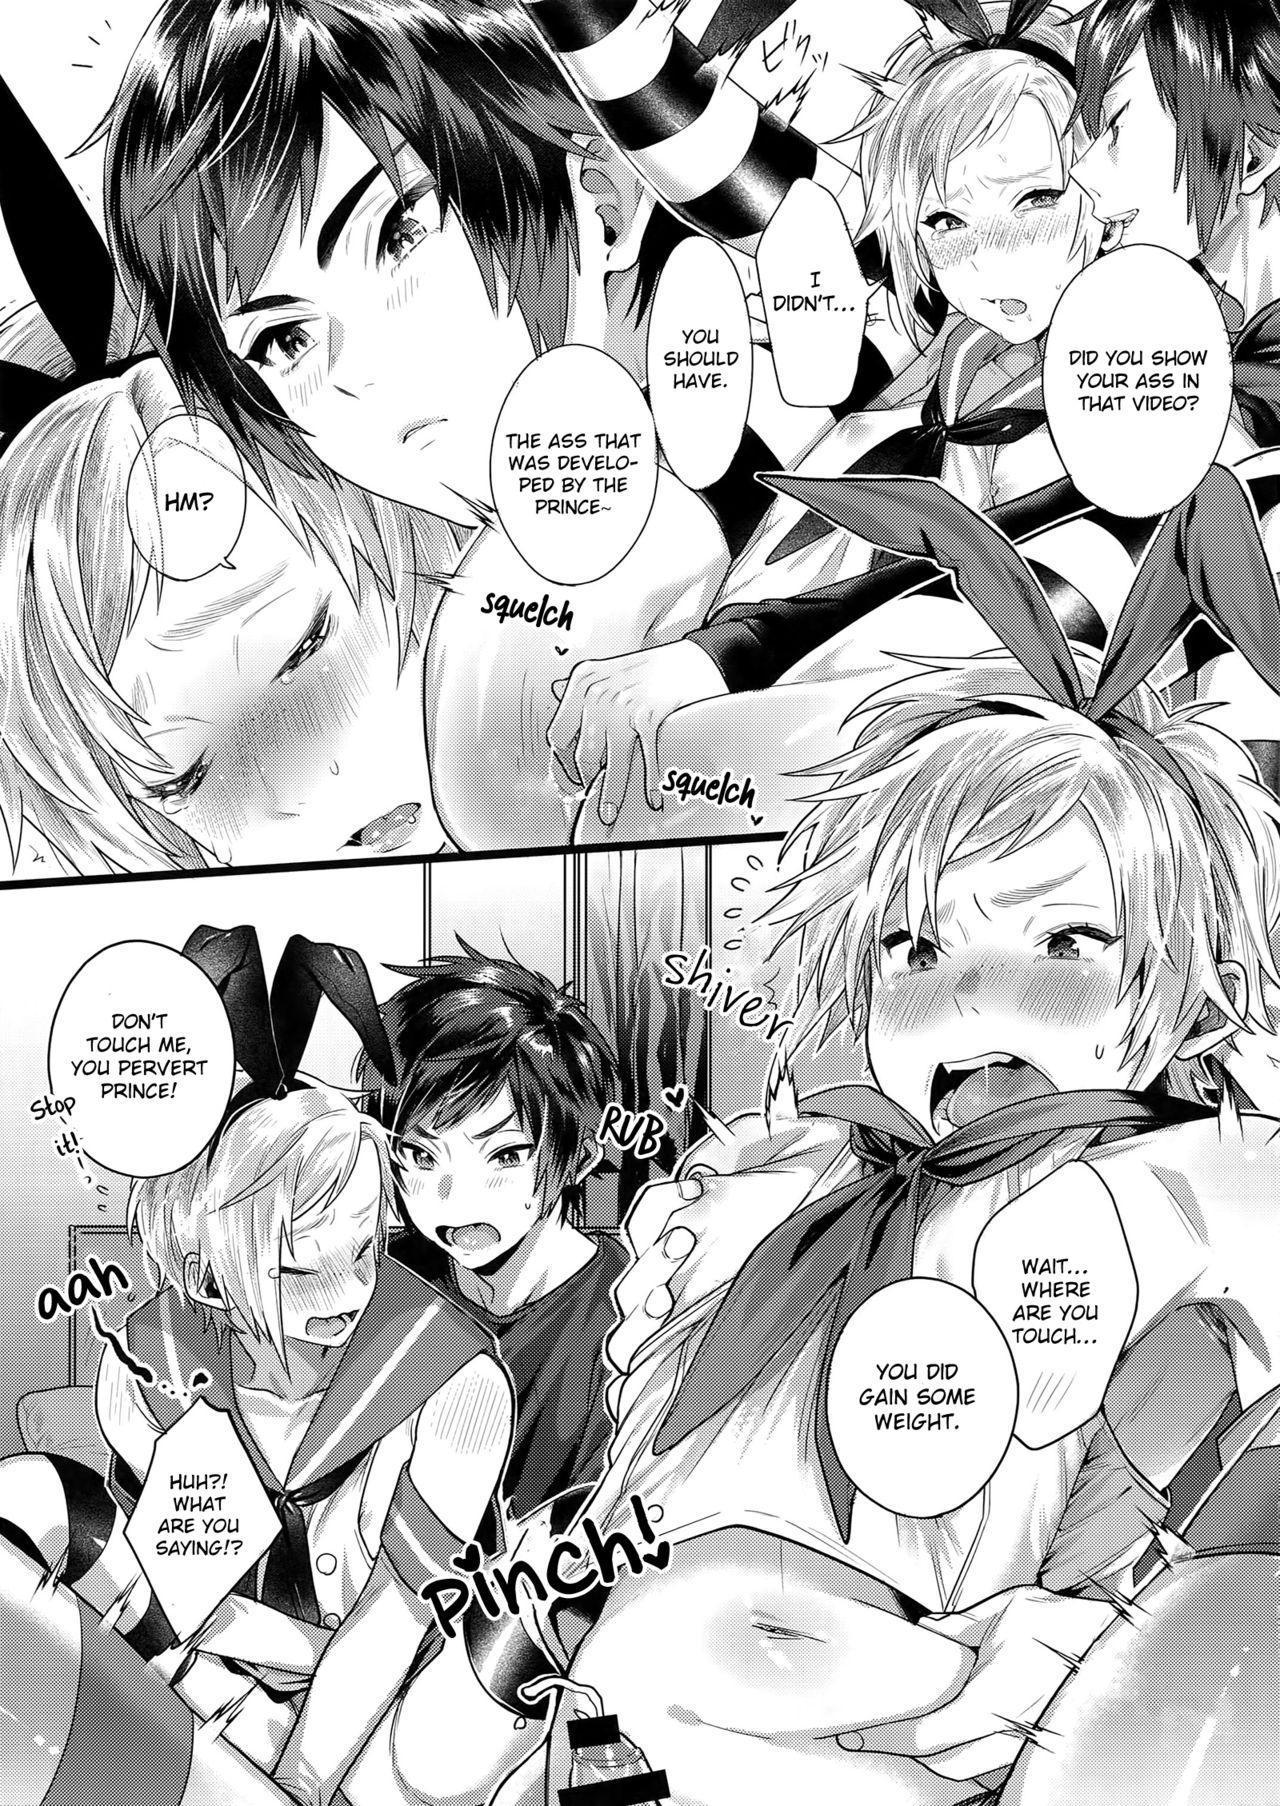 Taikei Iji no Shudan   Prompto Argentum-kun's Means For Maintaining His Body Shape! 7